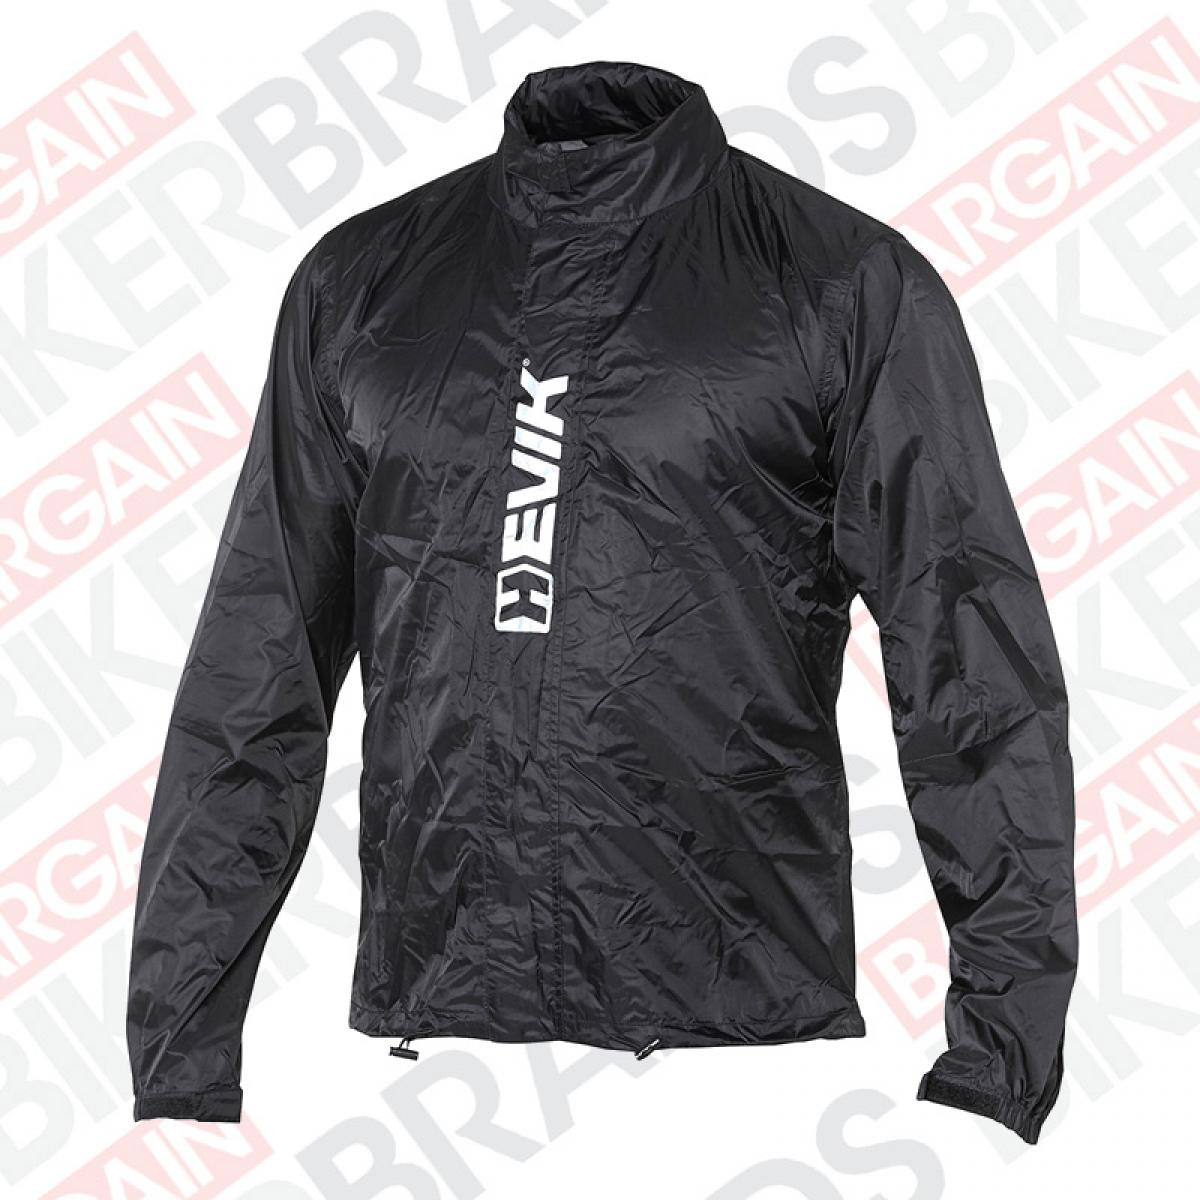 53ff4314974f Hevik HRJ106 UltraLight Waterproof Motorcycle Over Jacket Rain Jacket -  Black